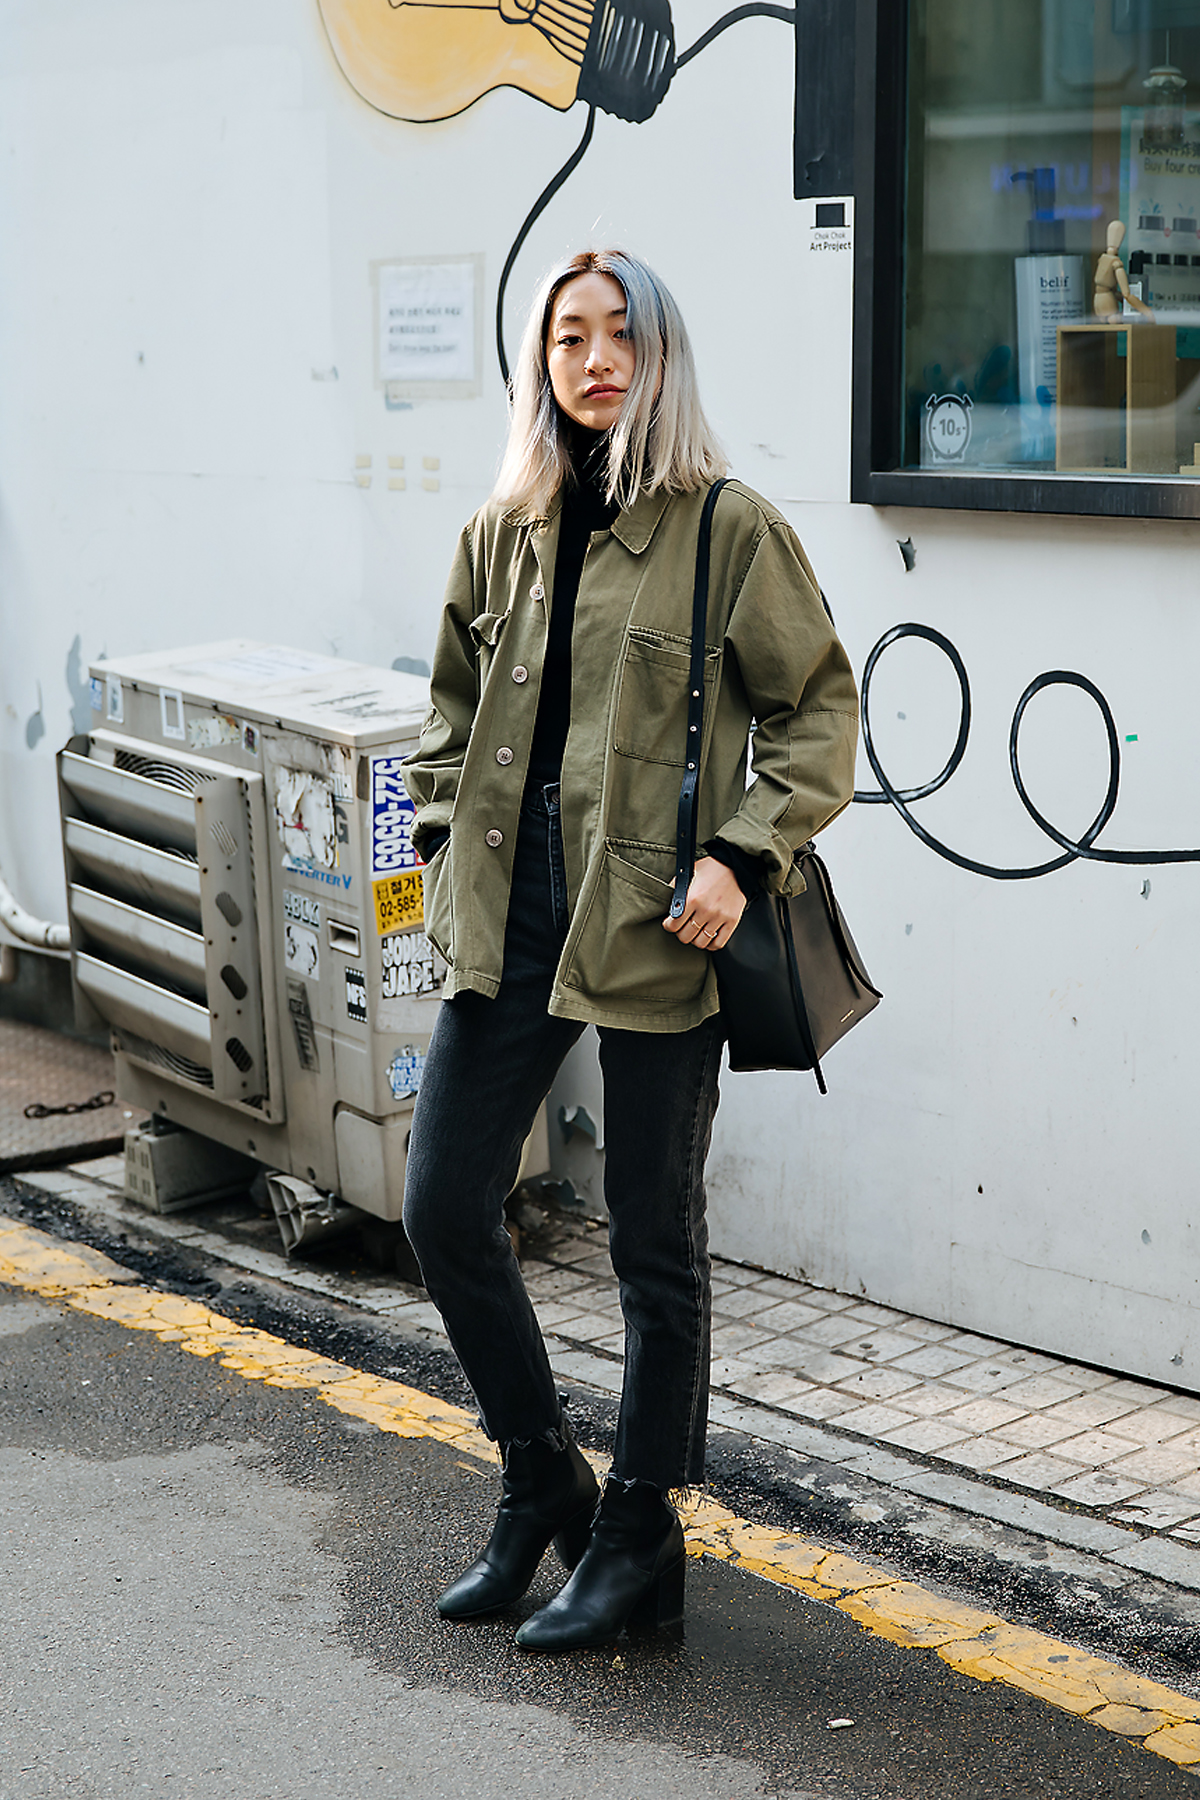 Kim Dahye, Street style women spring 2018 in seoul